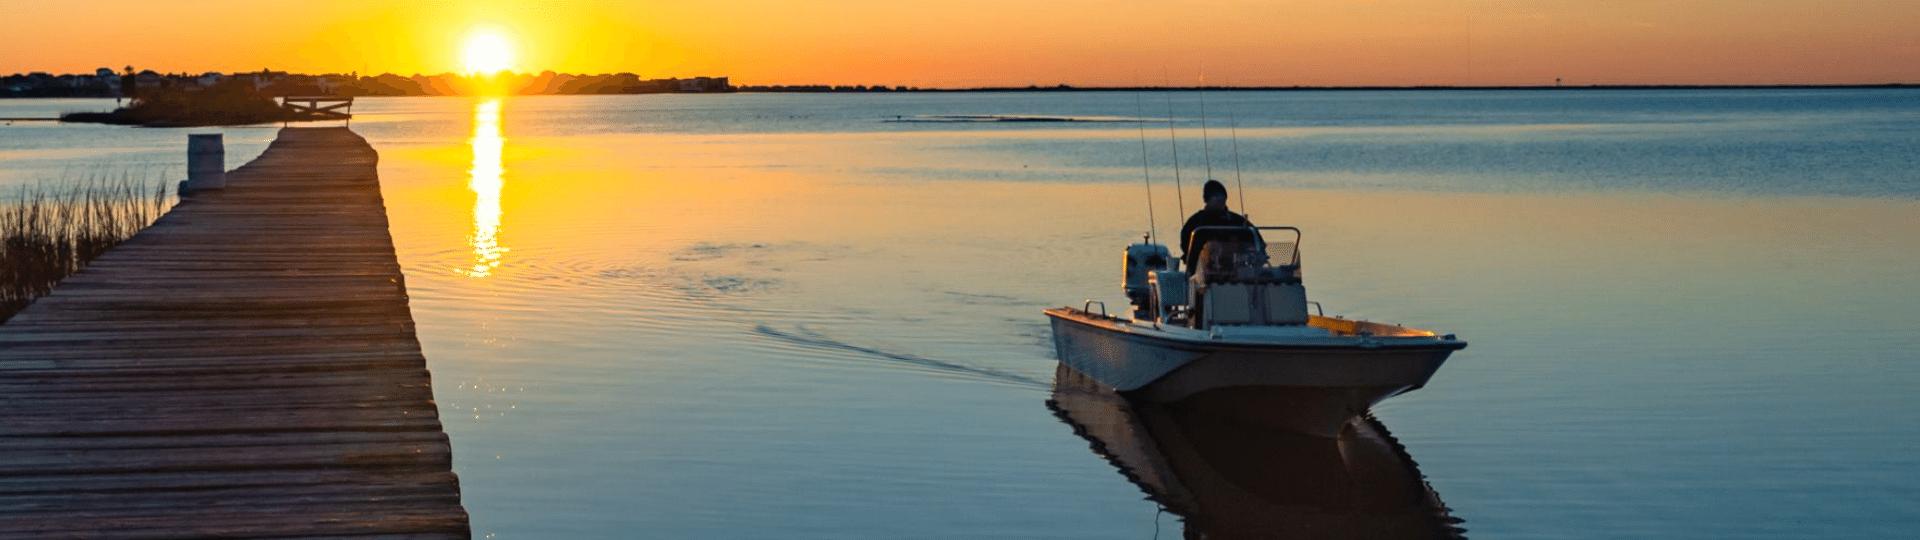 Boat at sunset in Galveston TX